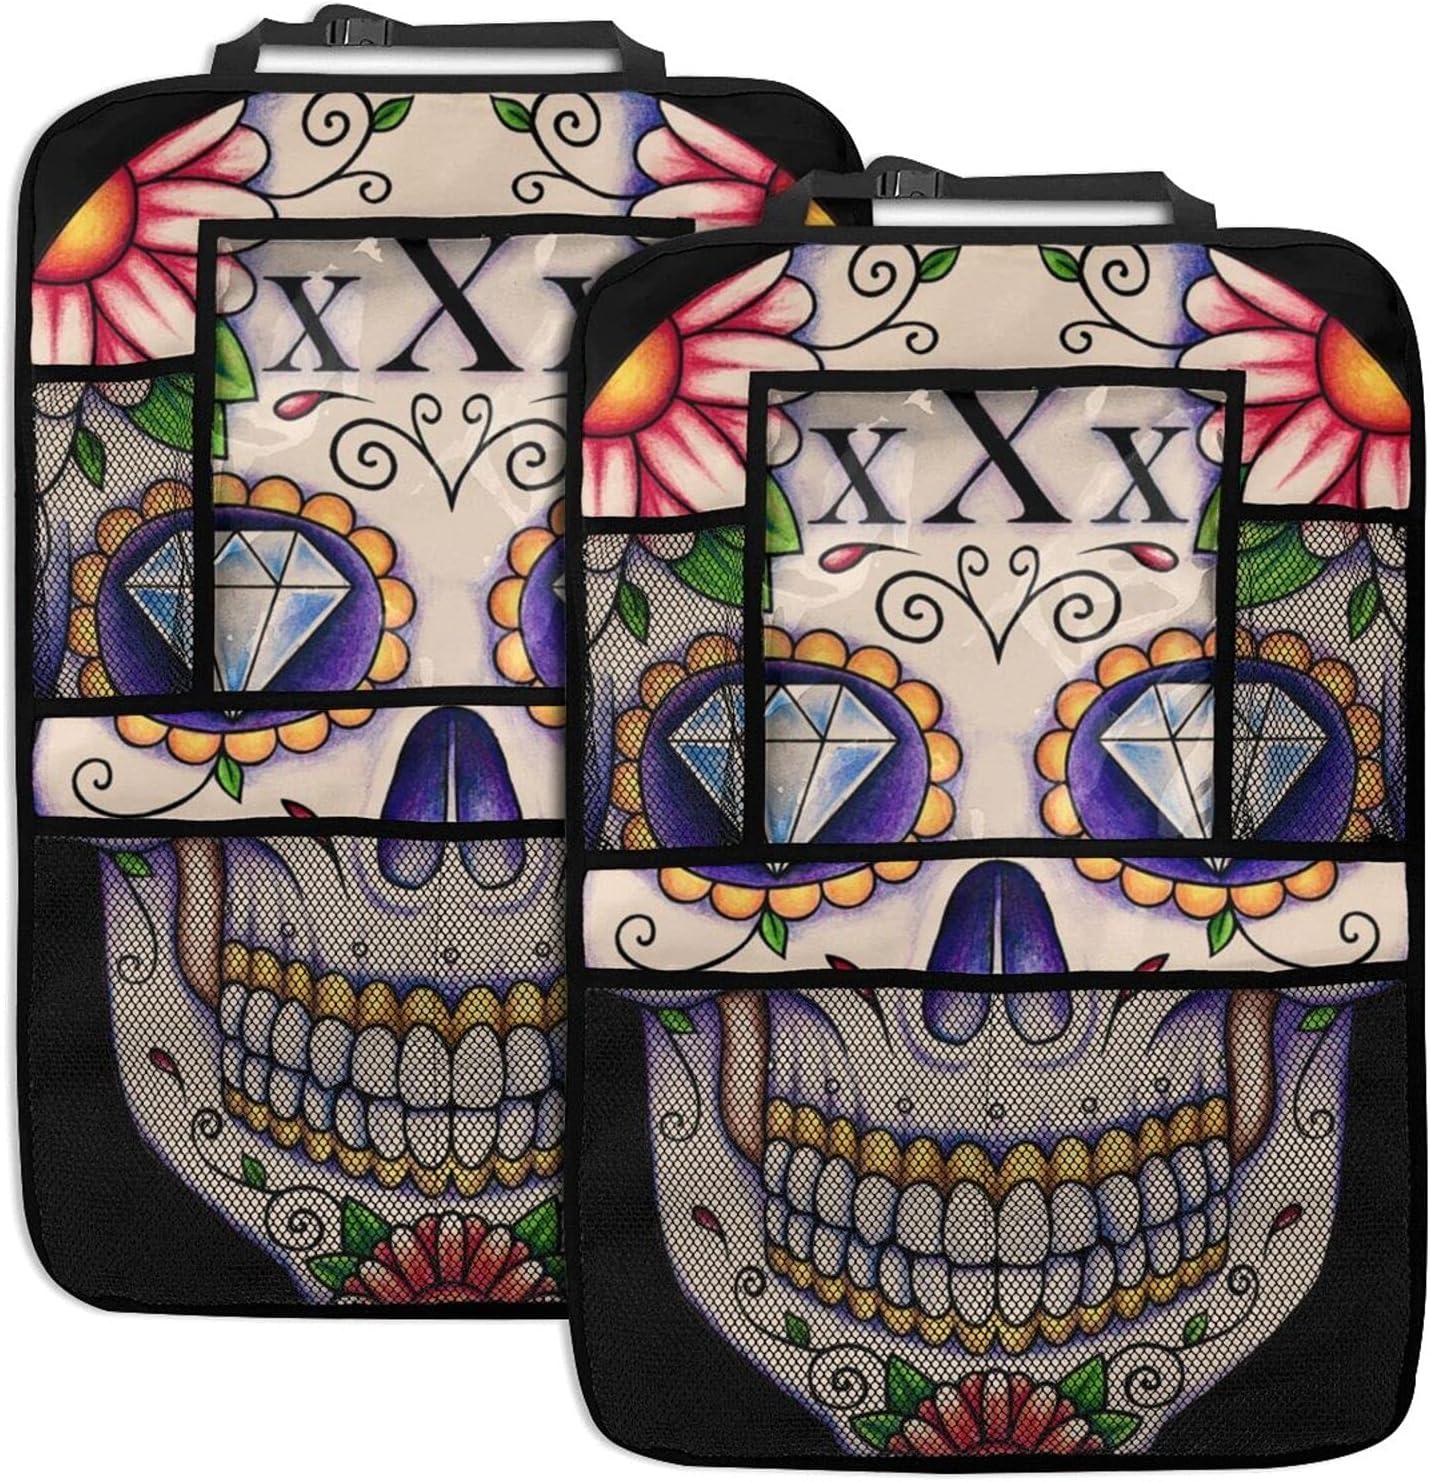 NELife Backseat Organizer Genuine 2 Pack - Sugar Max 73% OFF Tattoo Ey Skull Diamond